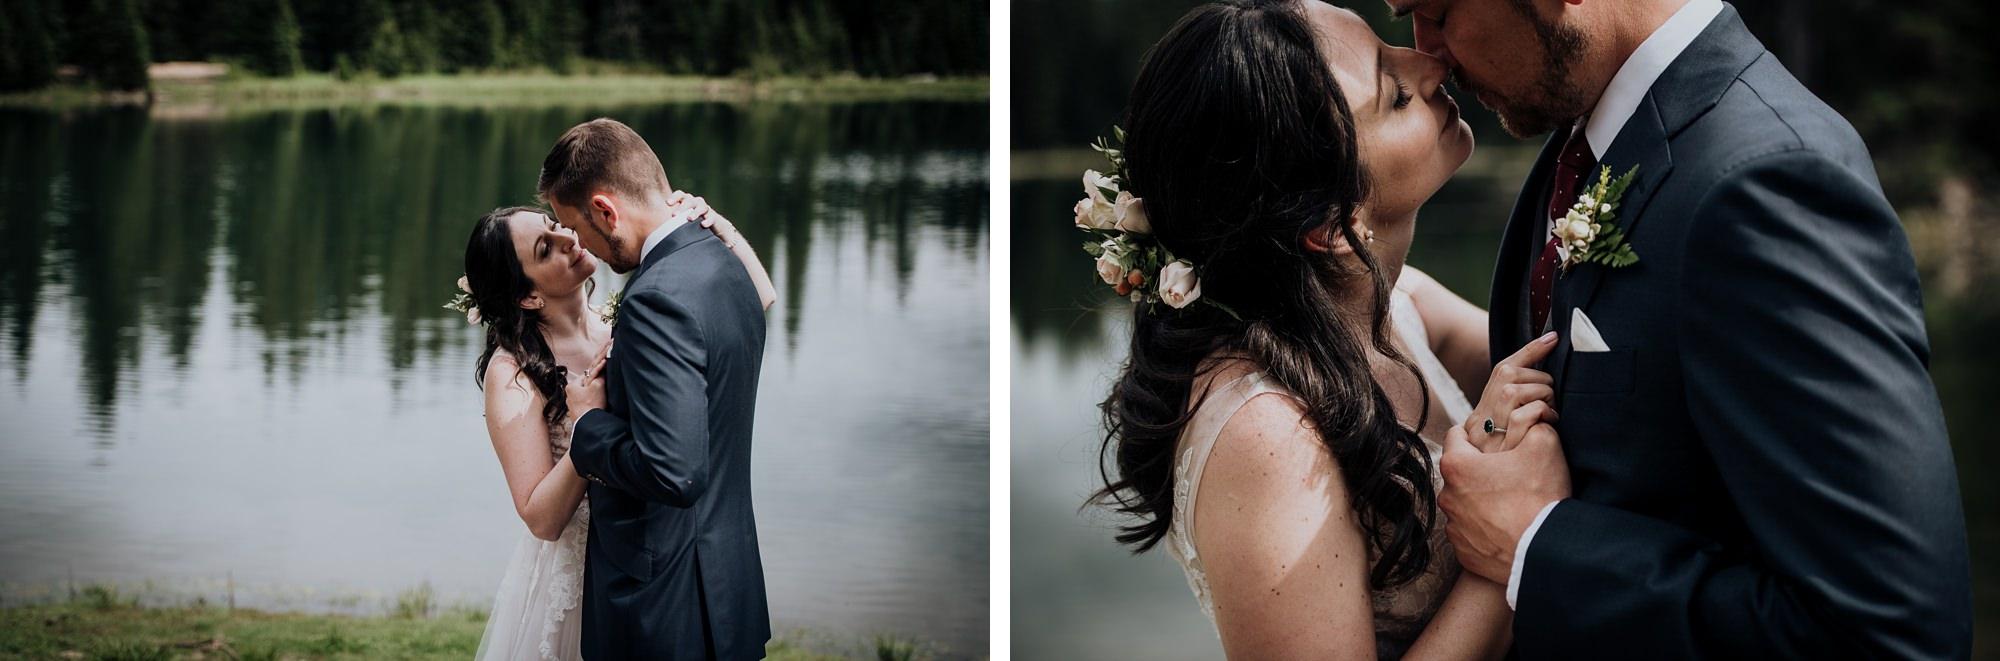 bride and groom at lake during island lake lodge wedding